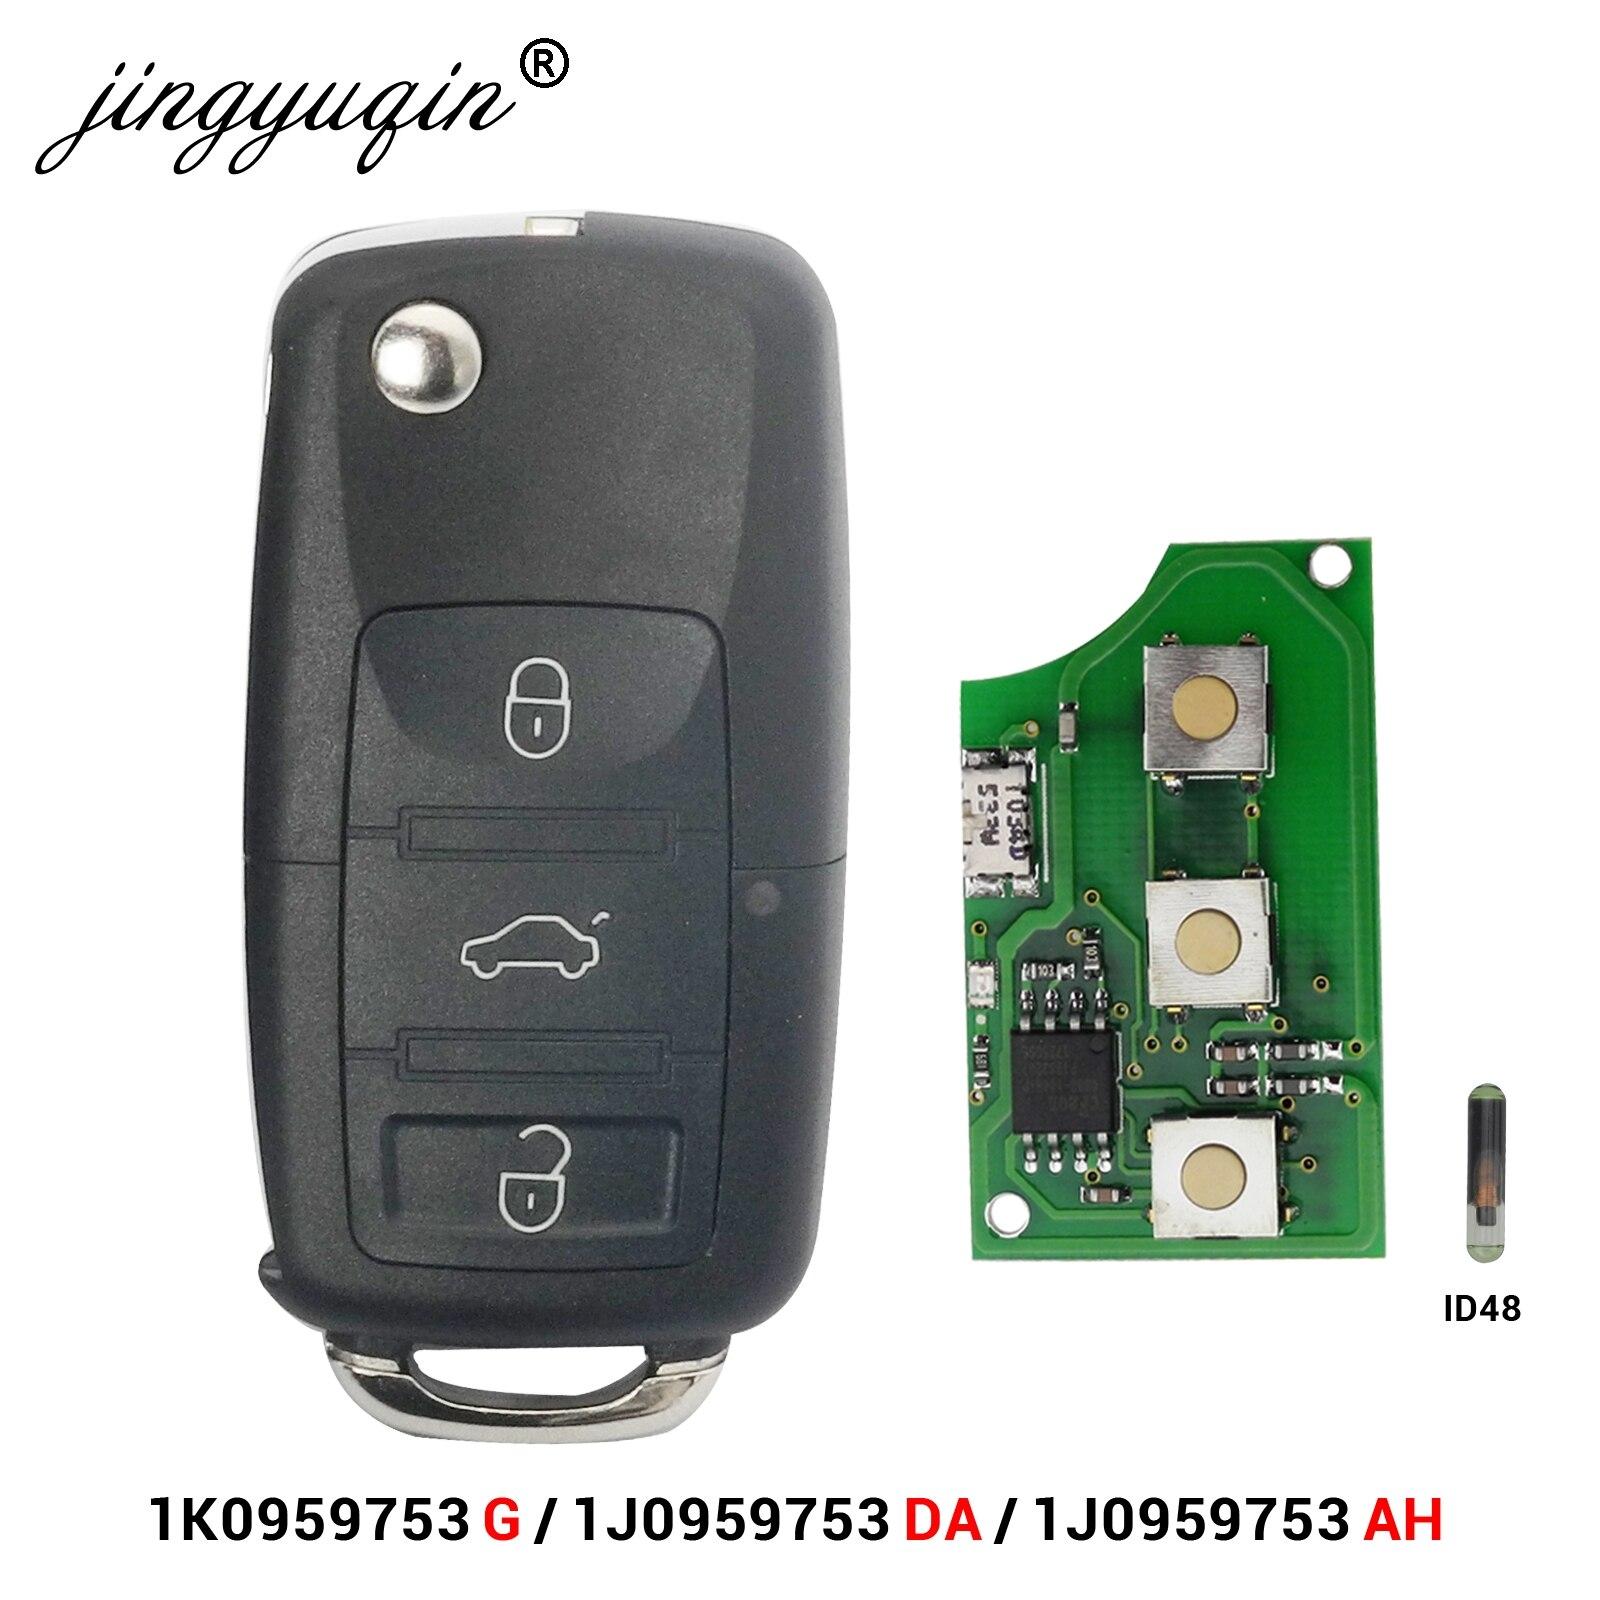 Jingyuqin 3 botão virar remoto carro chave fob para vw passat polo skoda seat polo/golf/besouro 1j0959753 da/ah 1k0959753g 434 mhz id48